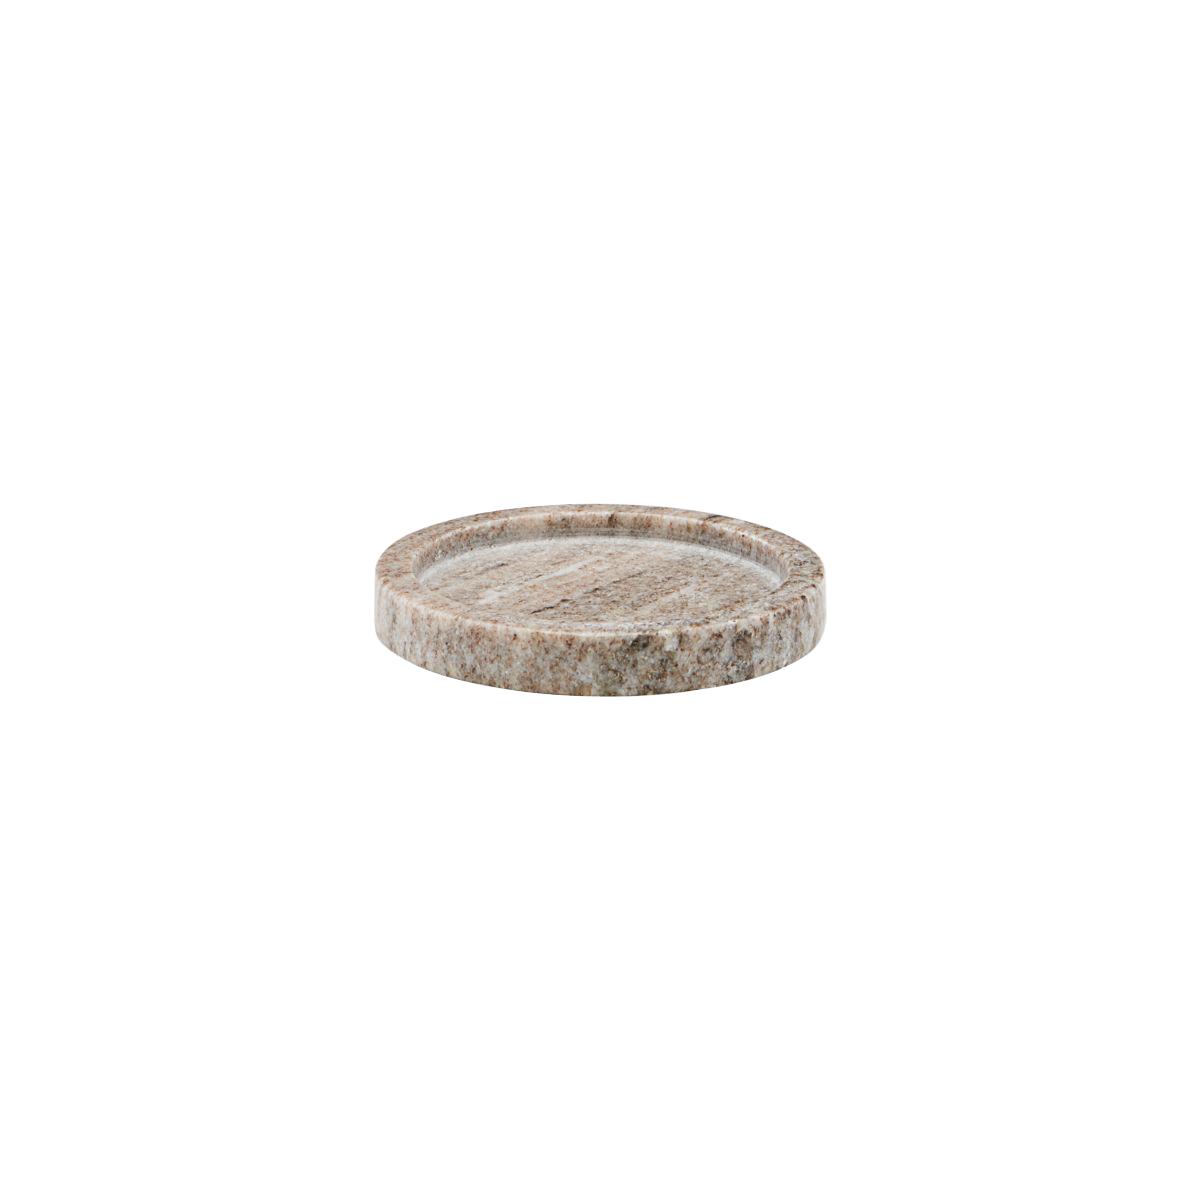 Meraki - Marble Tray Ø 12,5 cm - Beige (312530015/mkma015)